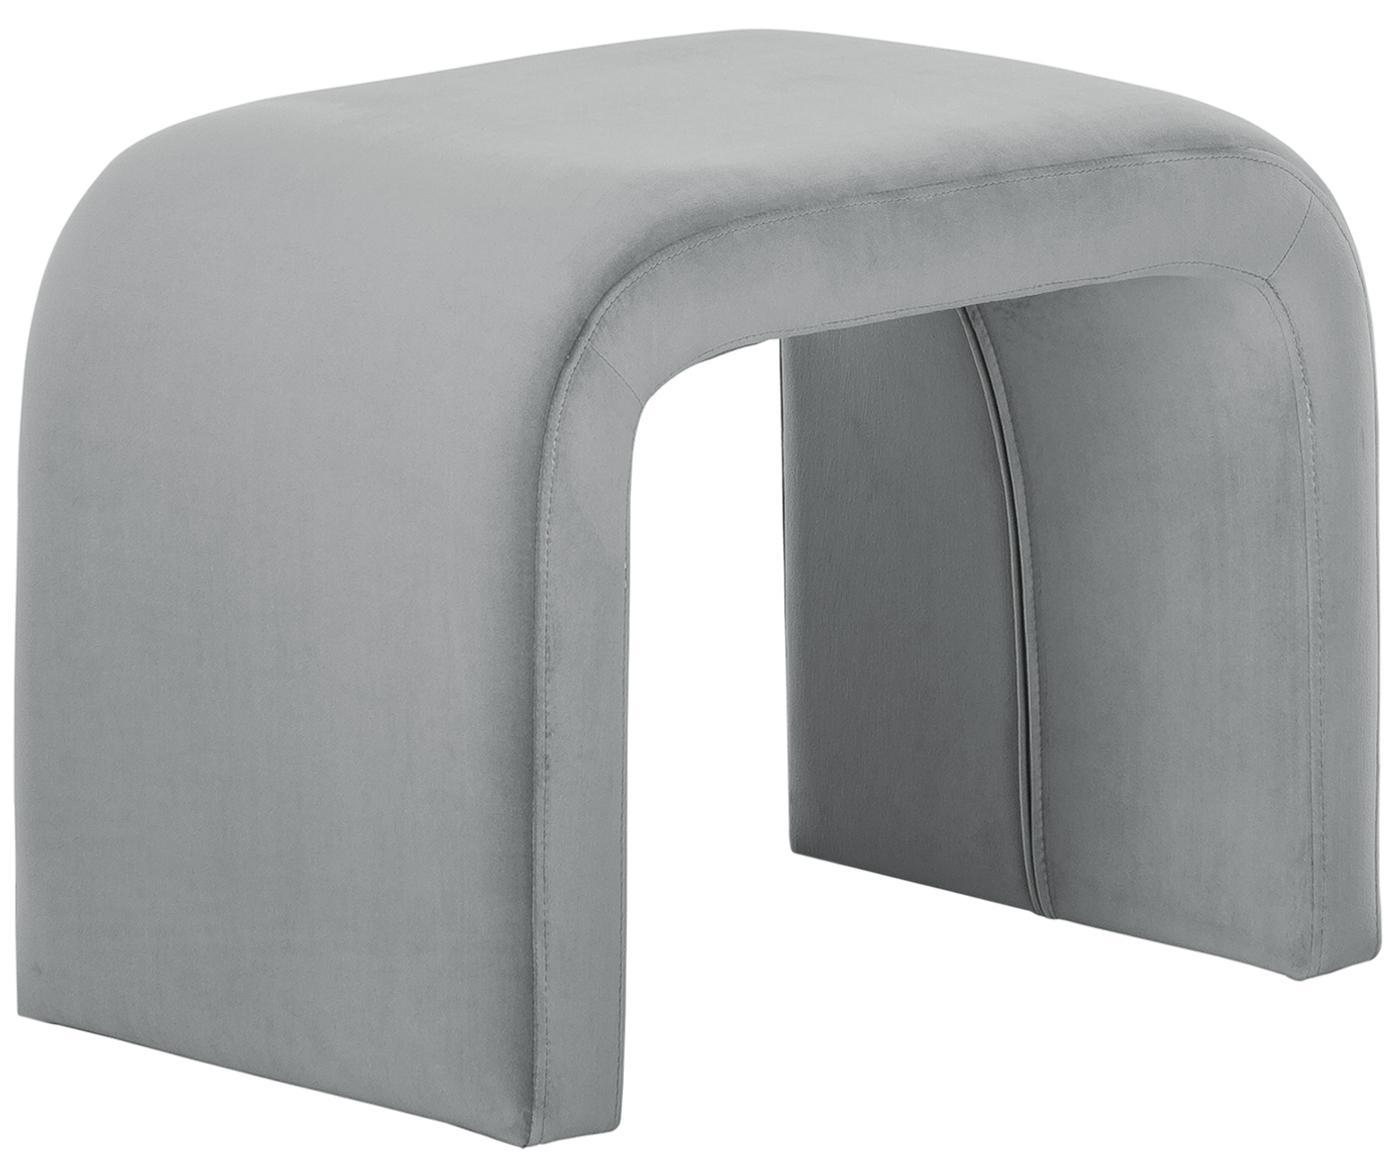 Samt-Hocker Penelope, Bezug: Samt (Polyester) 25.000 S, Gestell: Metall, Spanholz, Grau, 61 x 46 cm